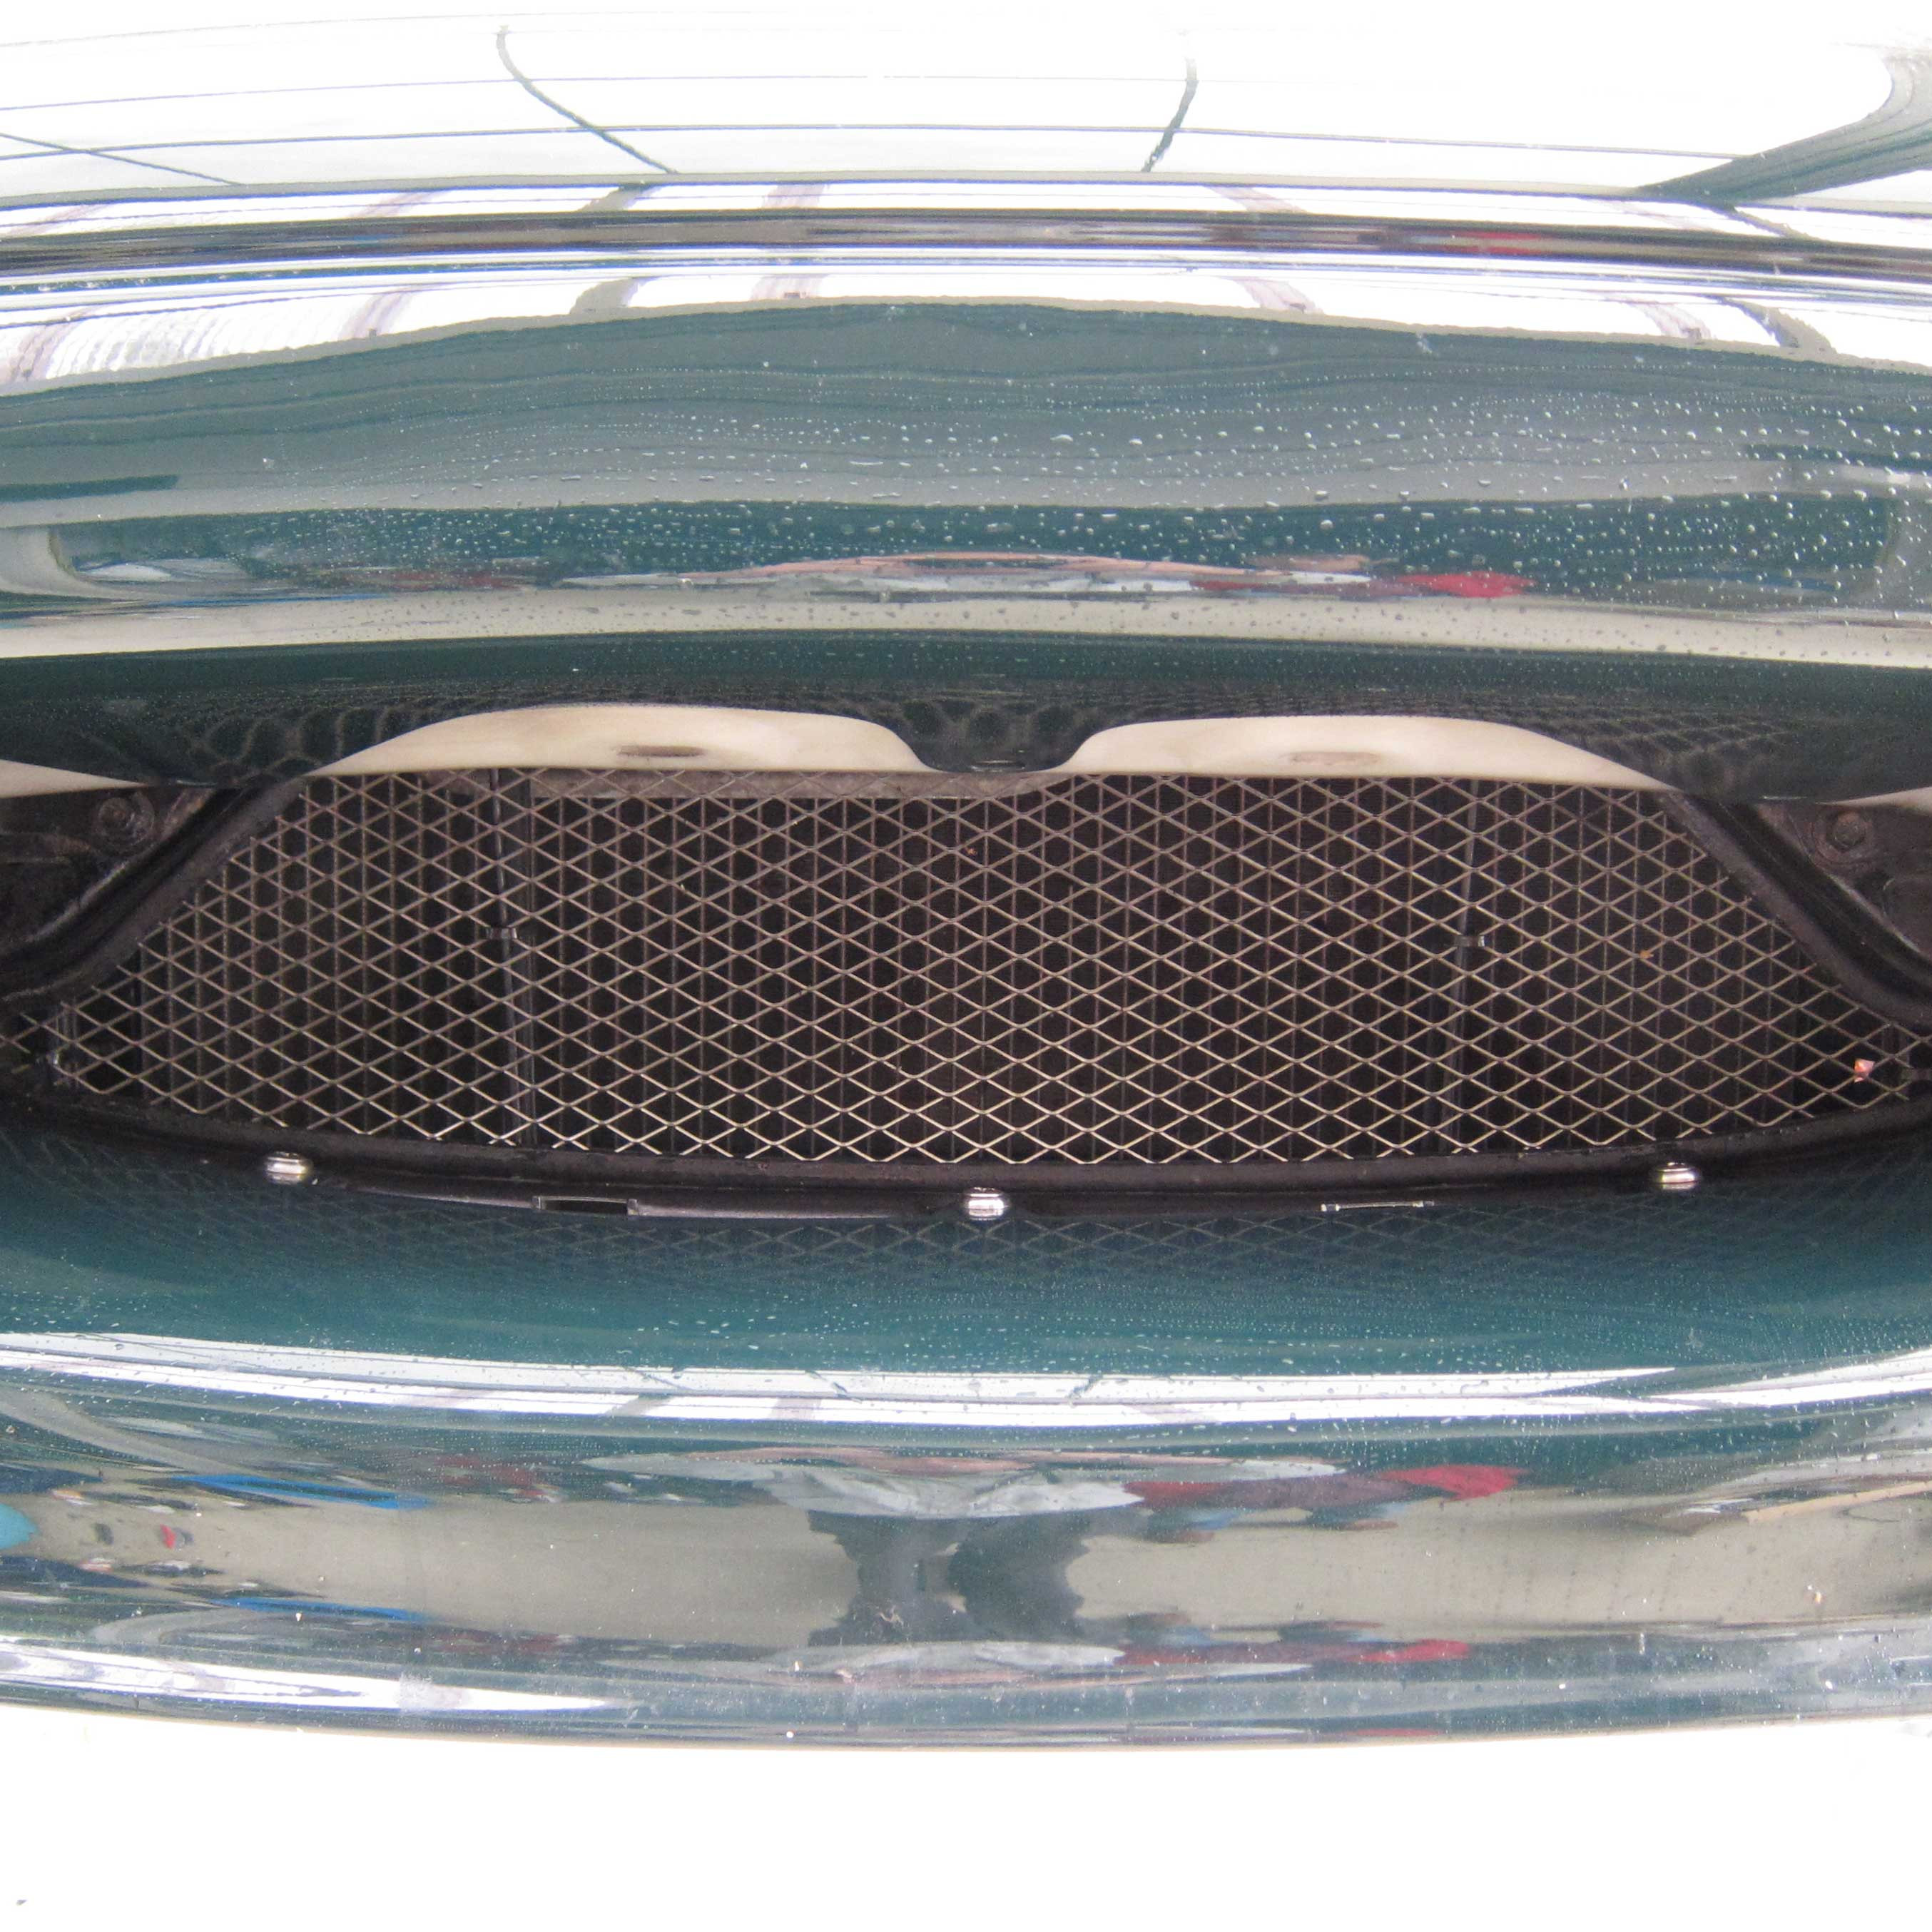 Nielex Front Grill For Miata MX5 MX-5 89-05 JDM Roadster : REV9 Autosport